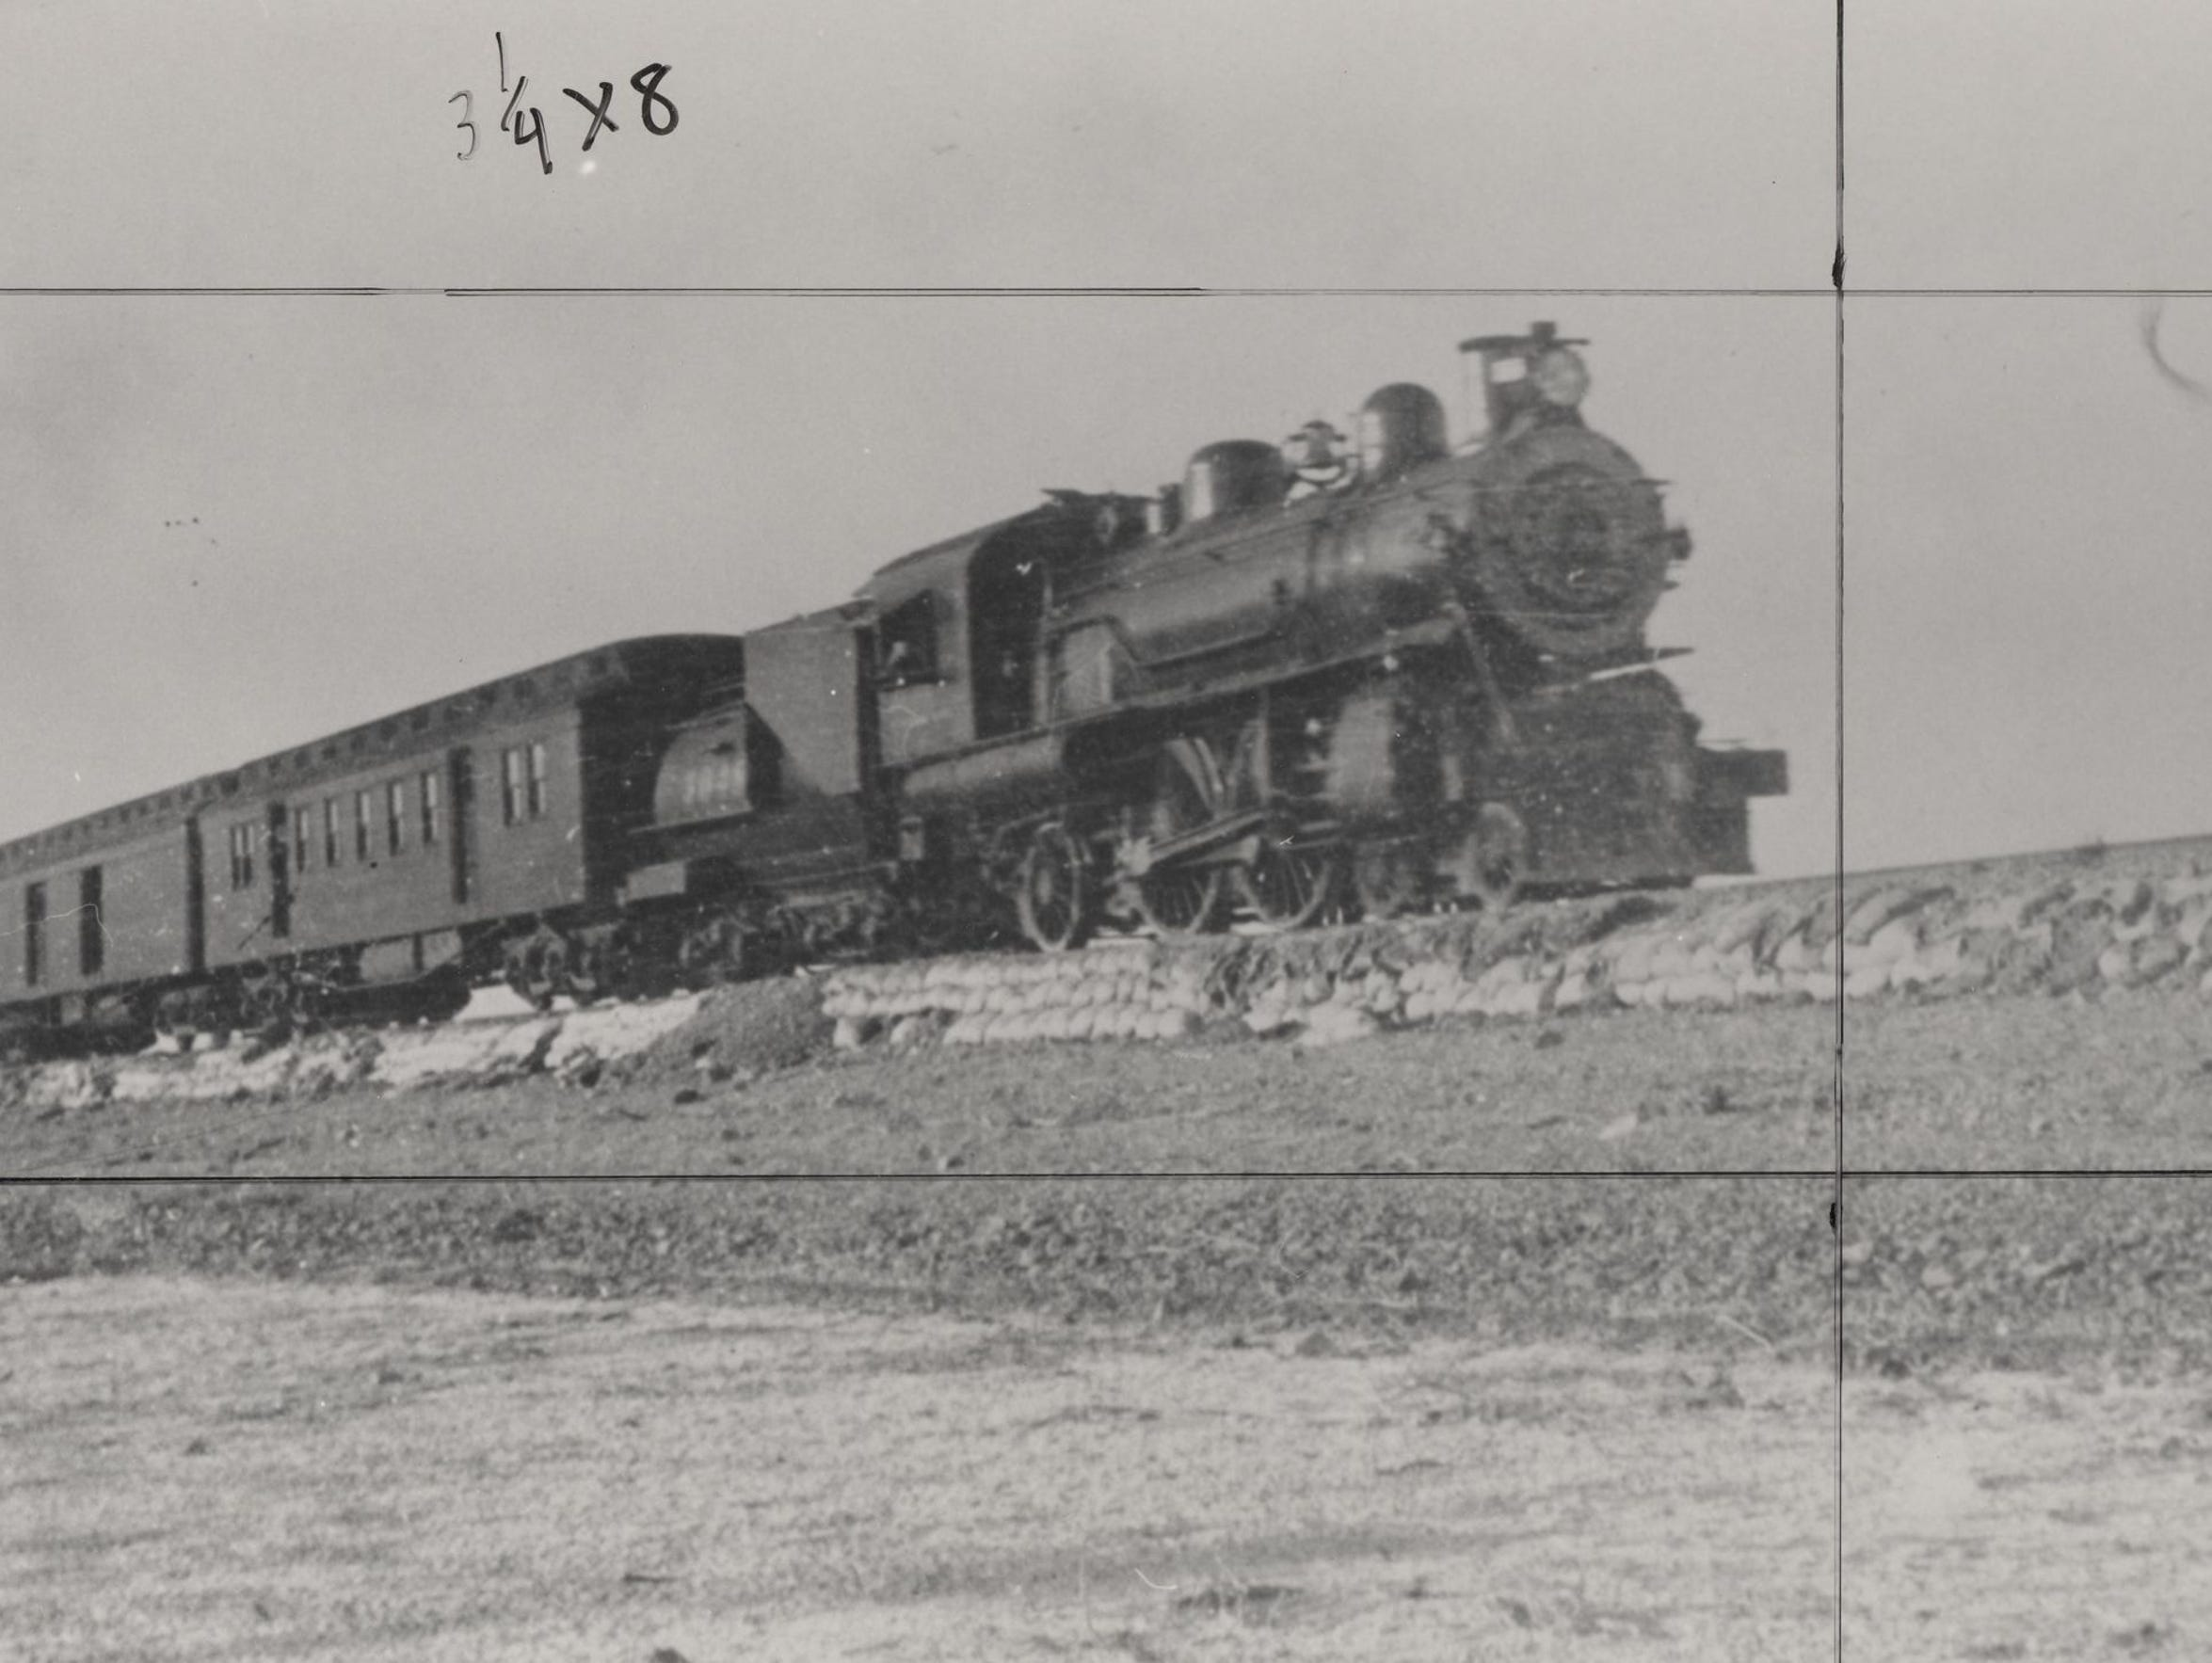 Southern Pacific's local line through the Coachella